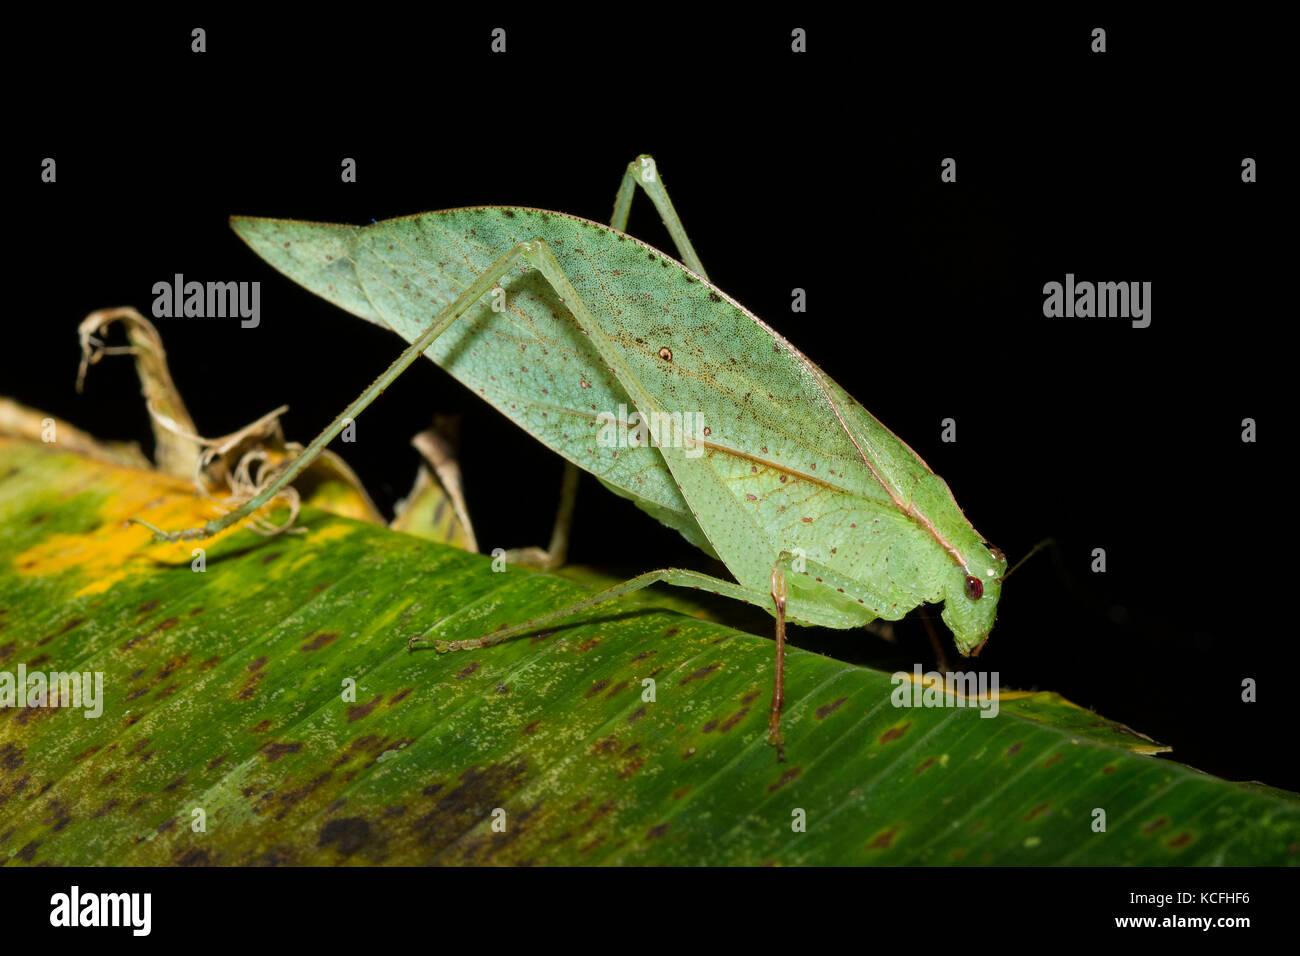 leaf-mimic, Katydid, Central America, Costa Rica - Stock Image